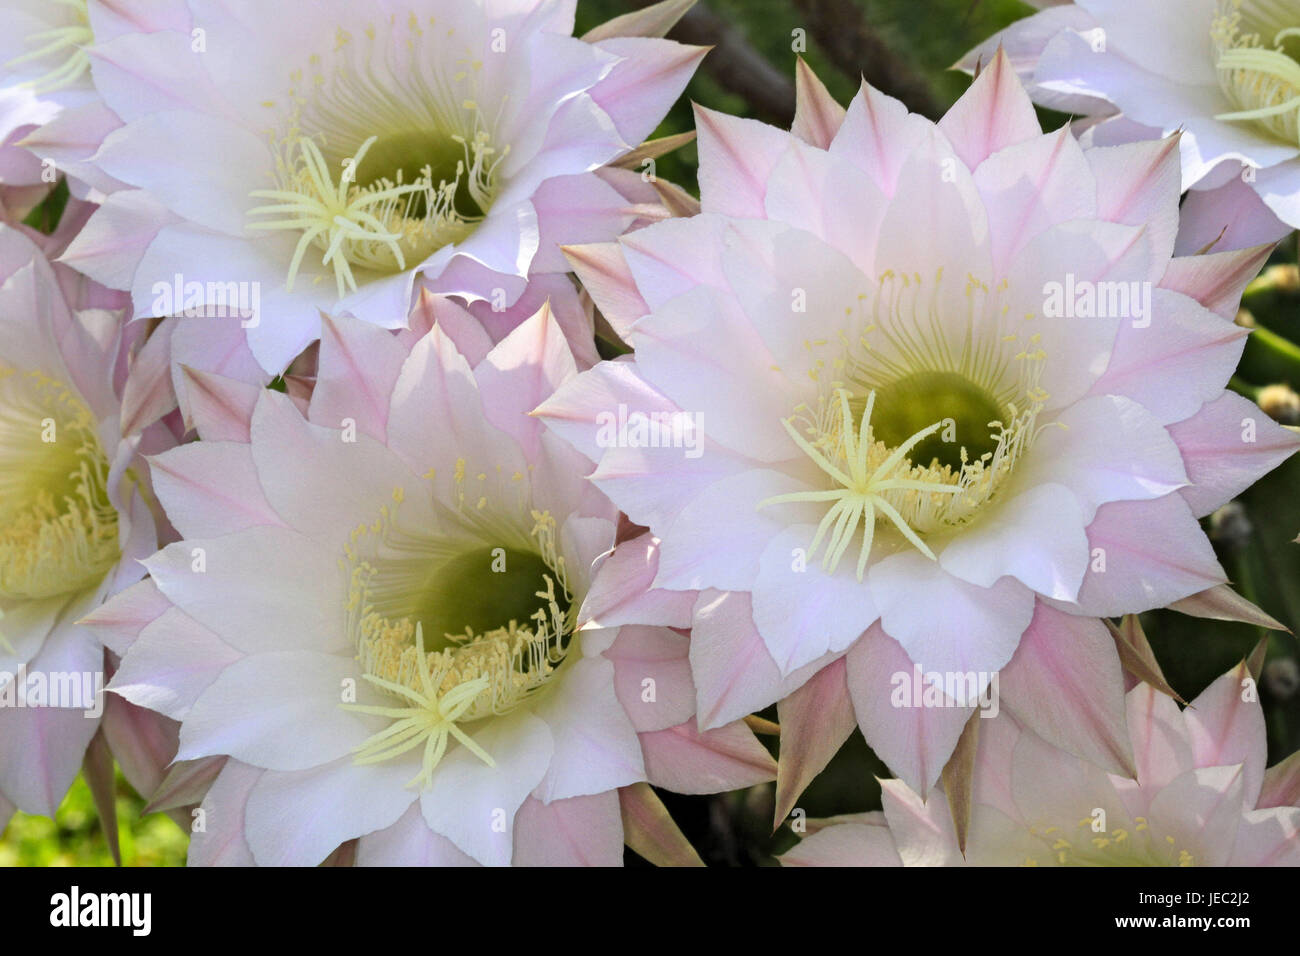 Hedgehog's cactus, blossom, Echinopsis, hybrida, cactus, cactus plant, spiny, blossoms, white, pink, softly, - Stock Image